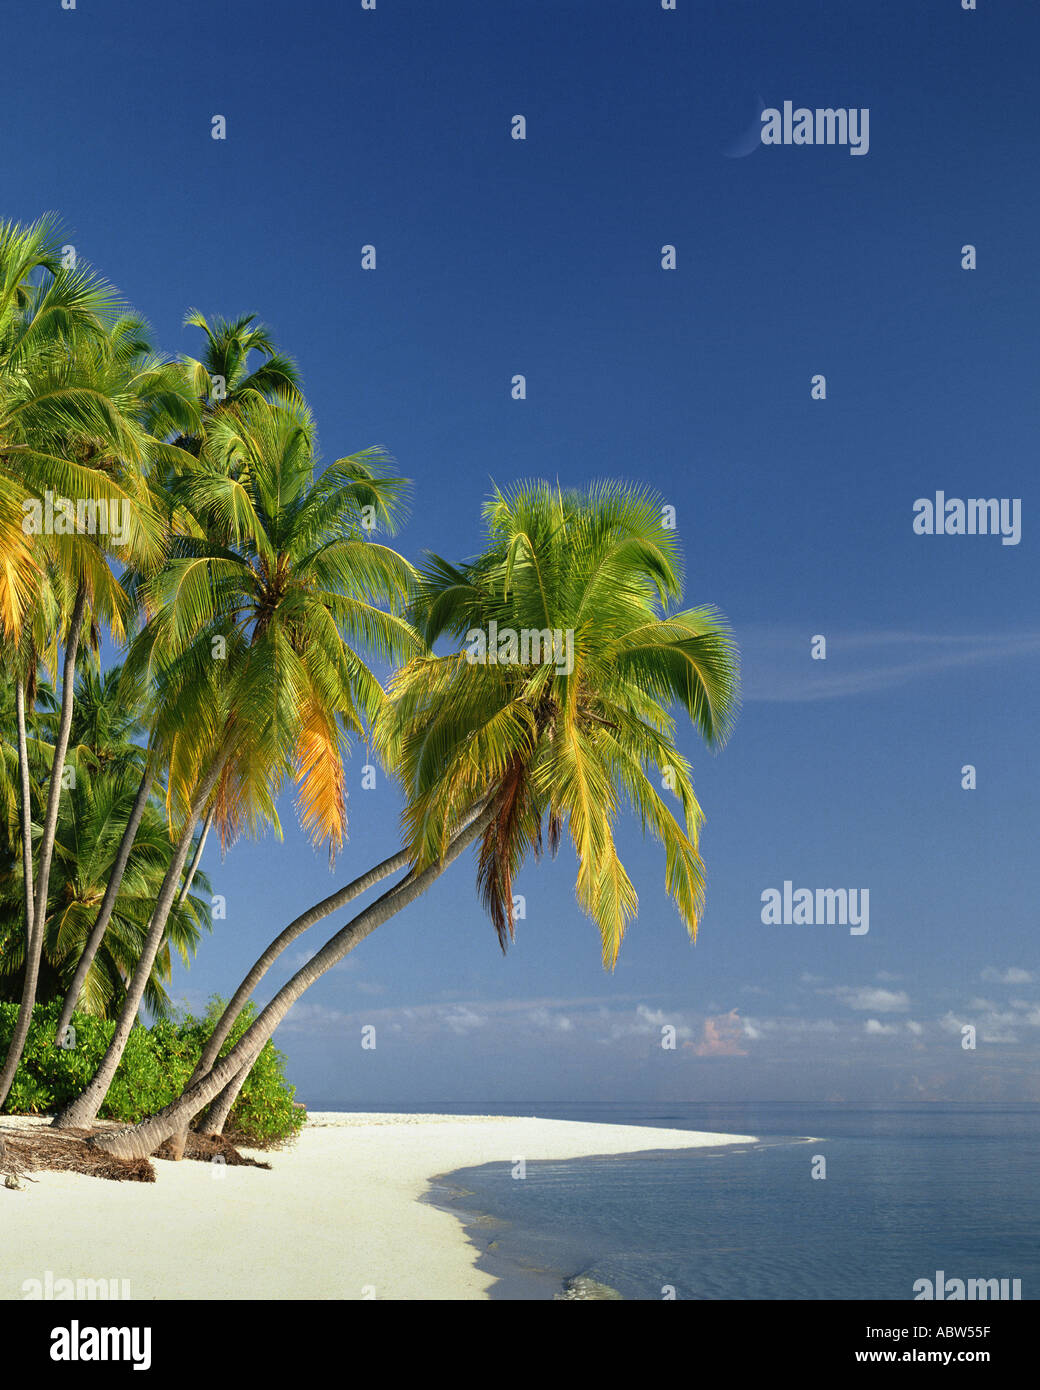 MV - Malediven: Strand entlang des Indischen Ozeans Stockbild